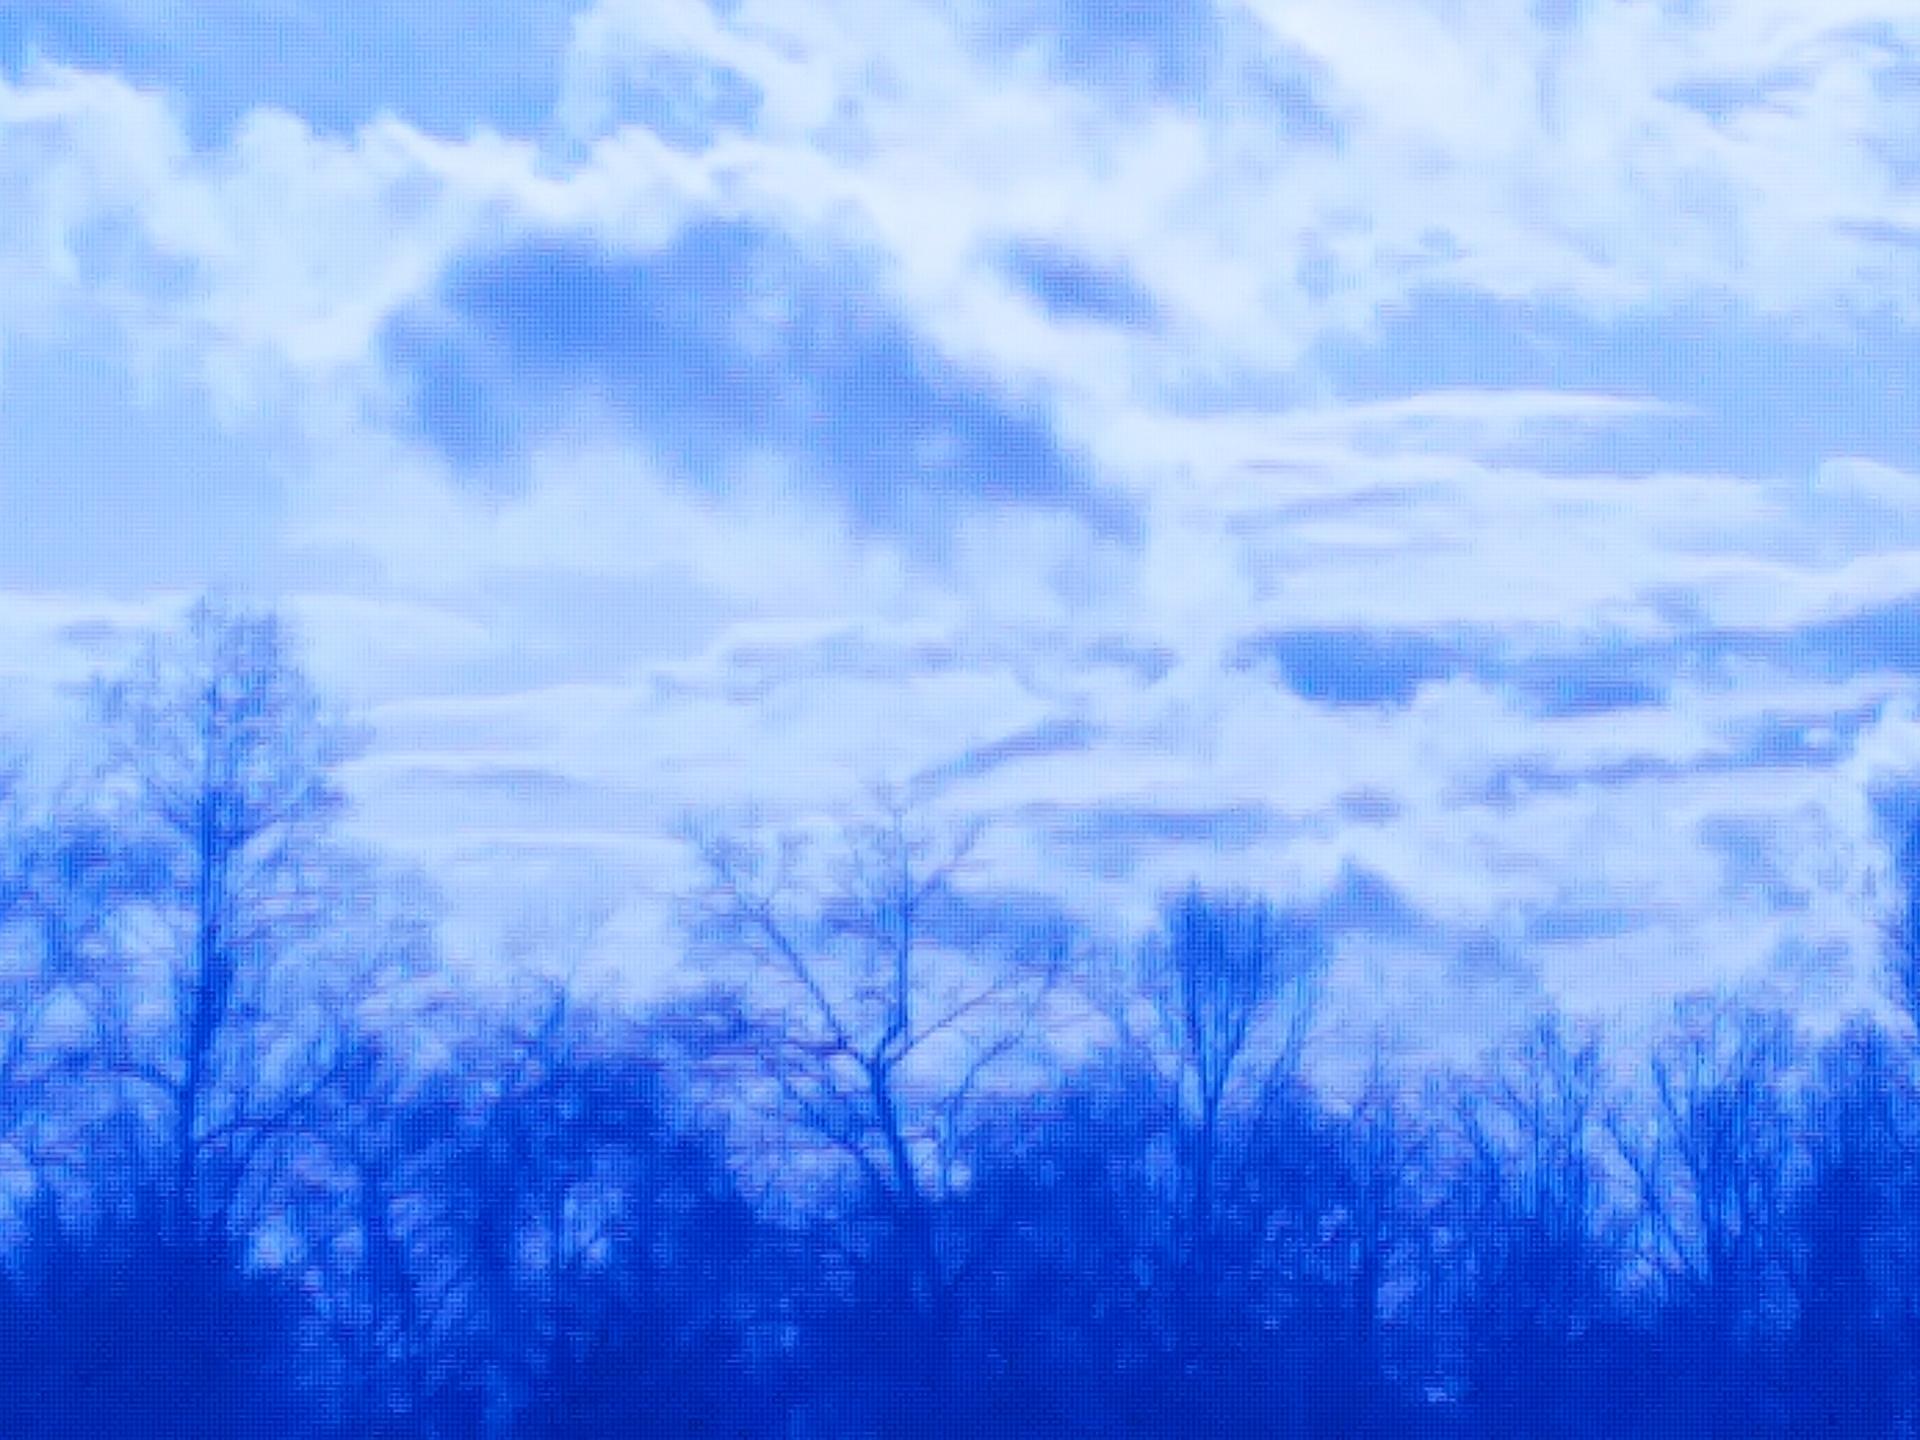 Cloudy haze | codenamesailorearth, background, air, cloudy